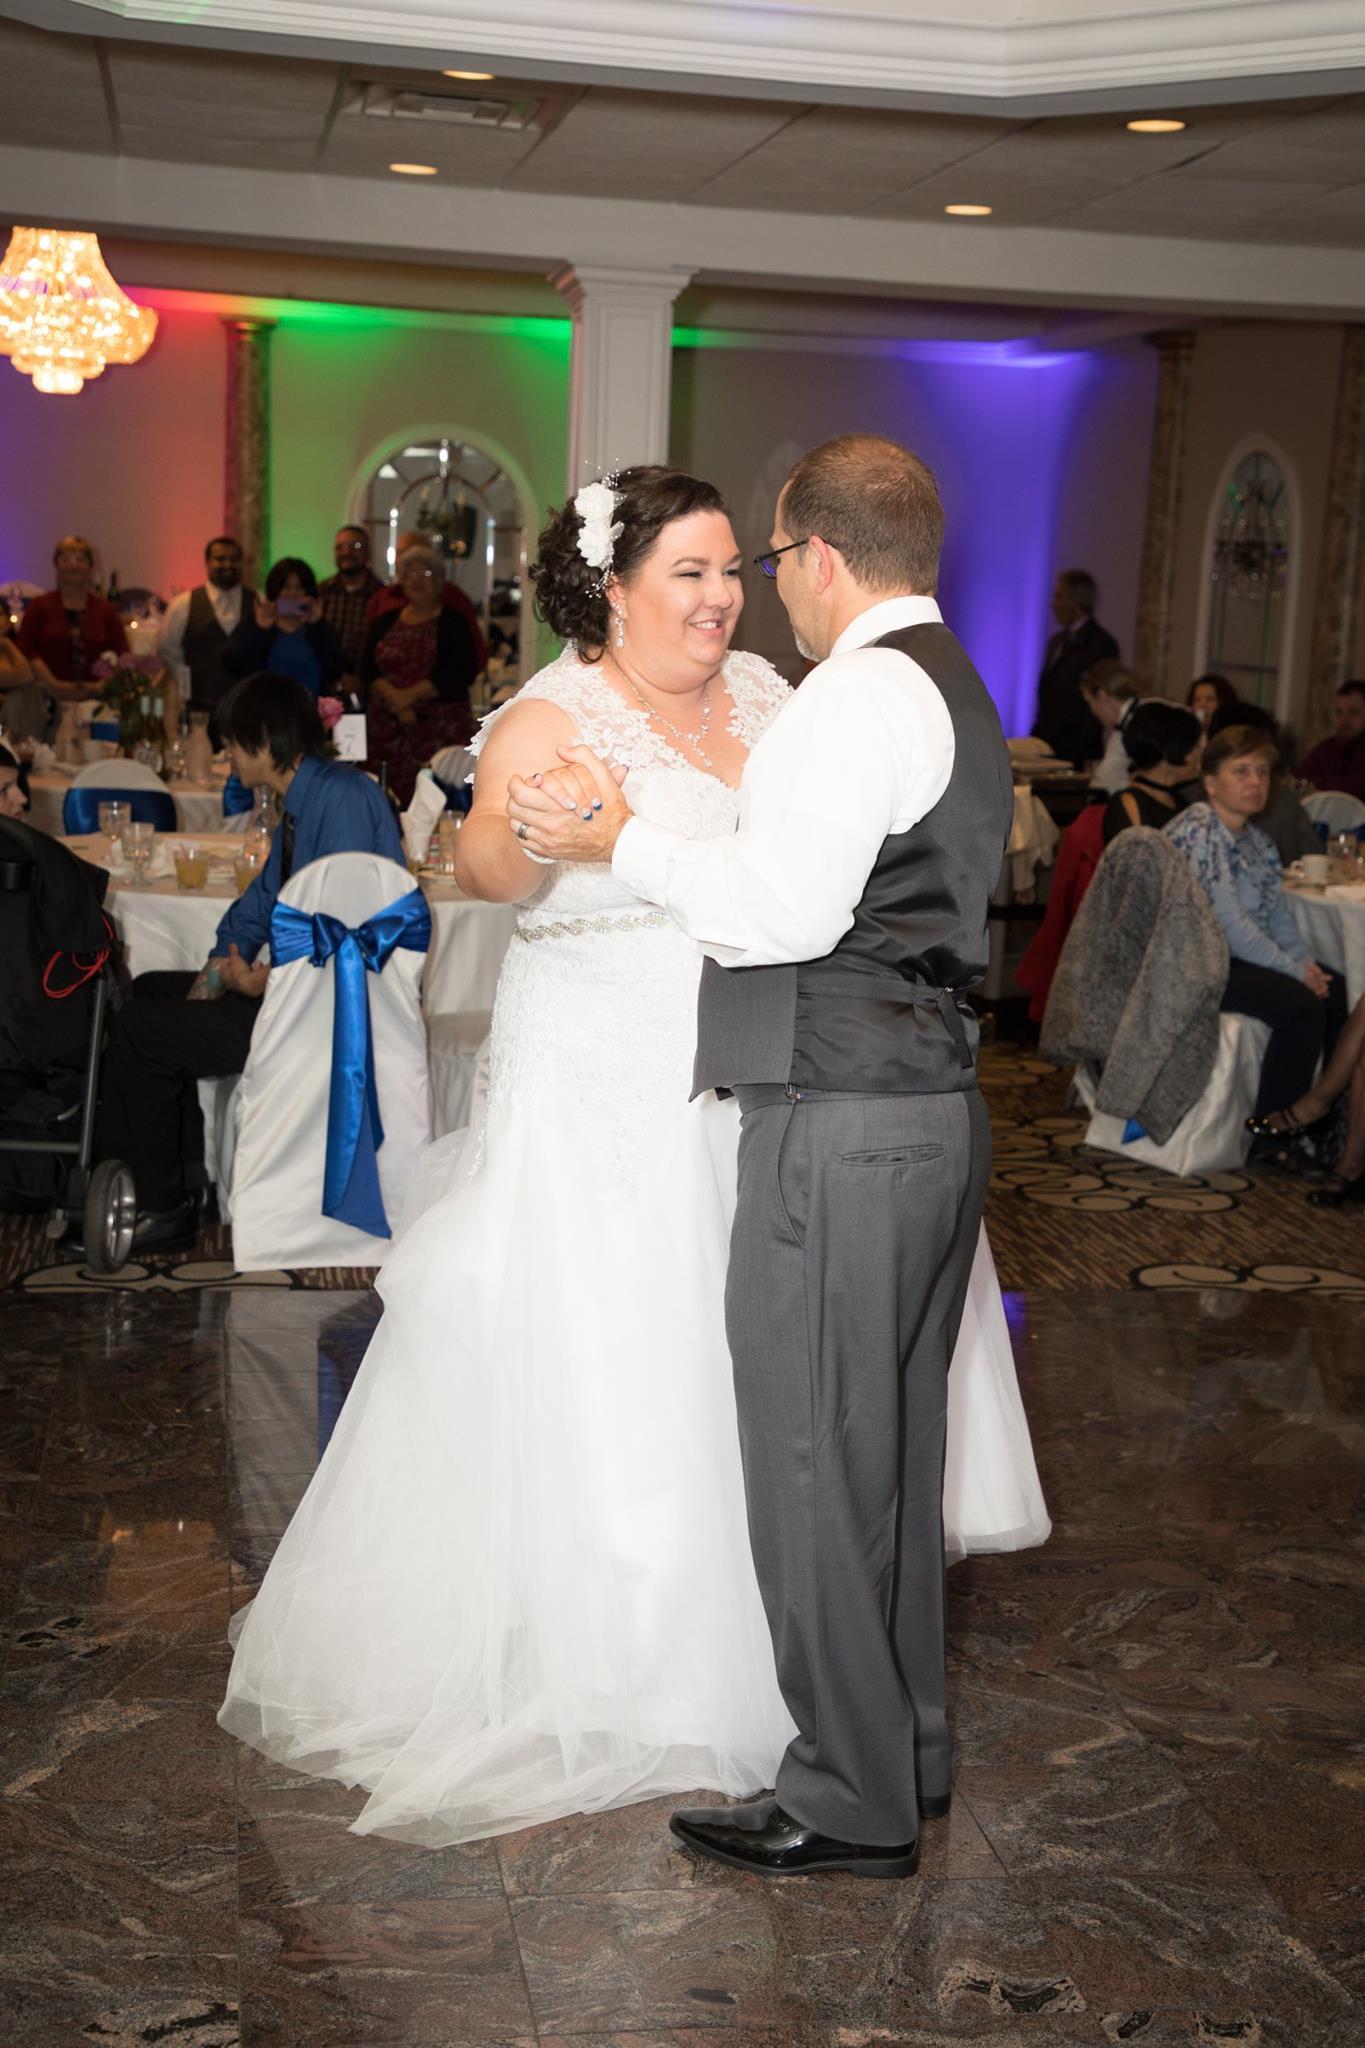 Wedding dance lessons Evanston